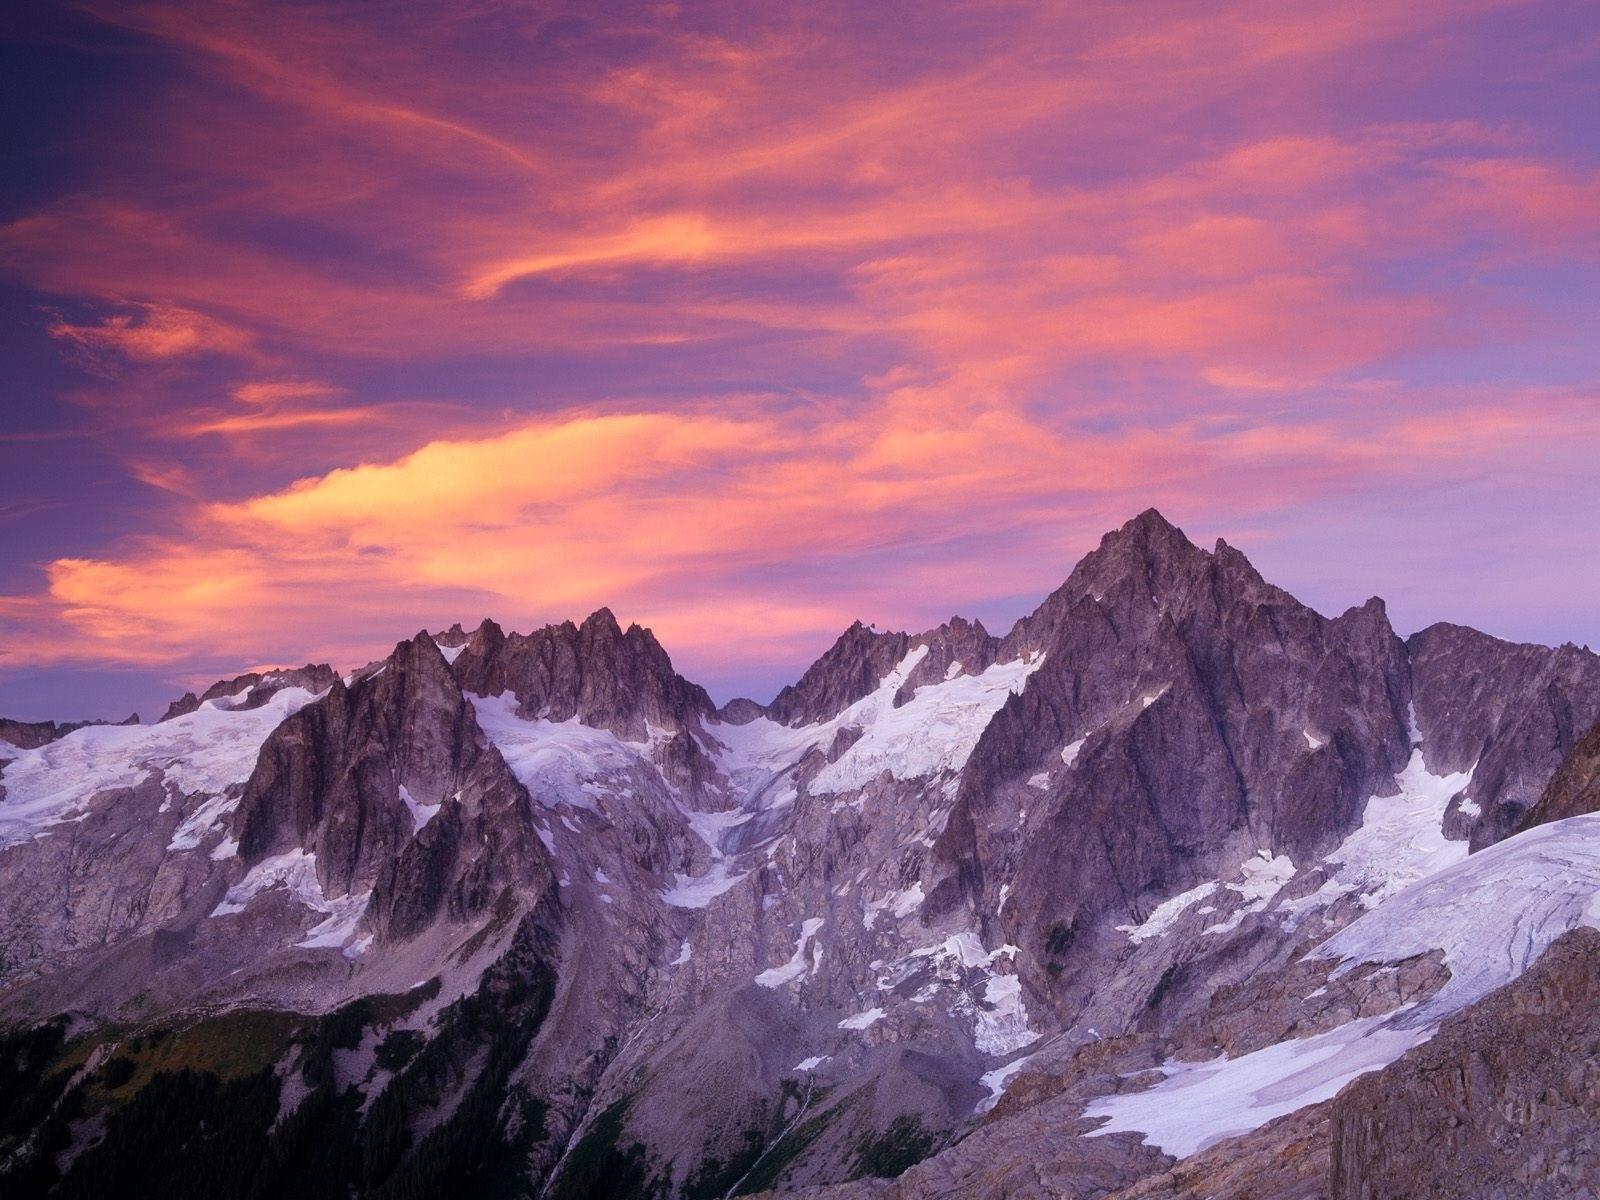 Iphone X 4k Wallpaper Download Winter Evening Mountains 1600 X 1200